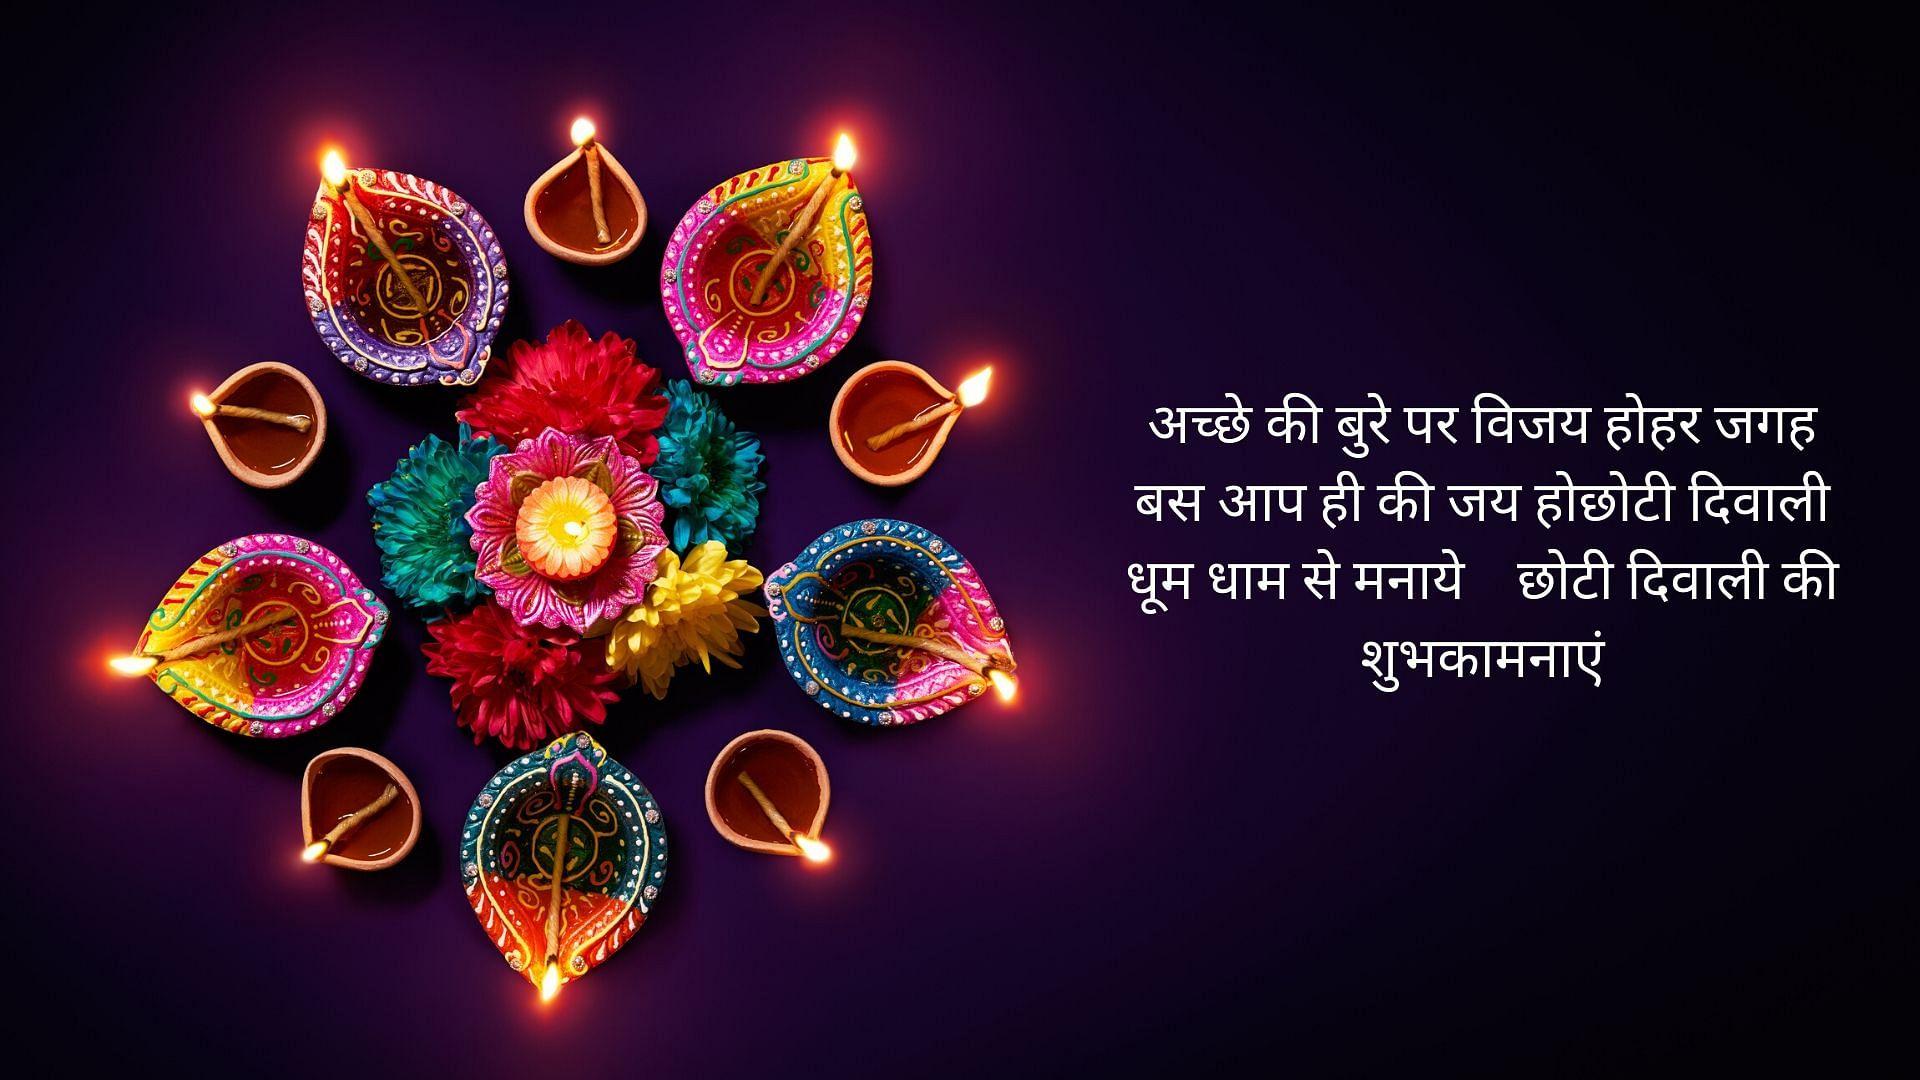 happy chhoti diwali wishes in english hindi chhoti diwali quotes